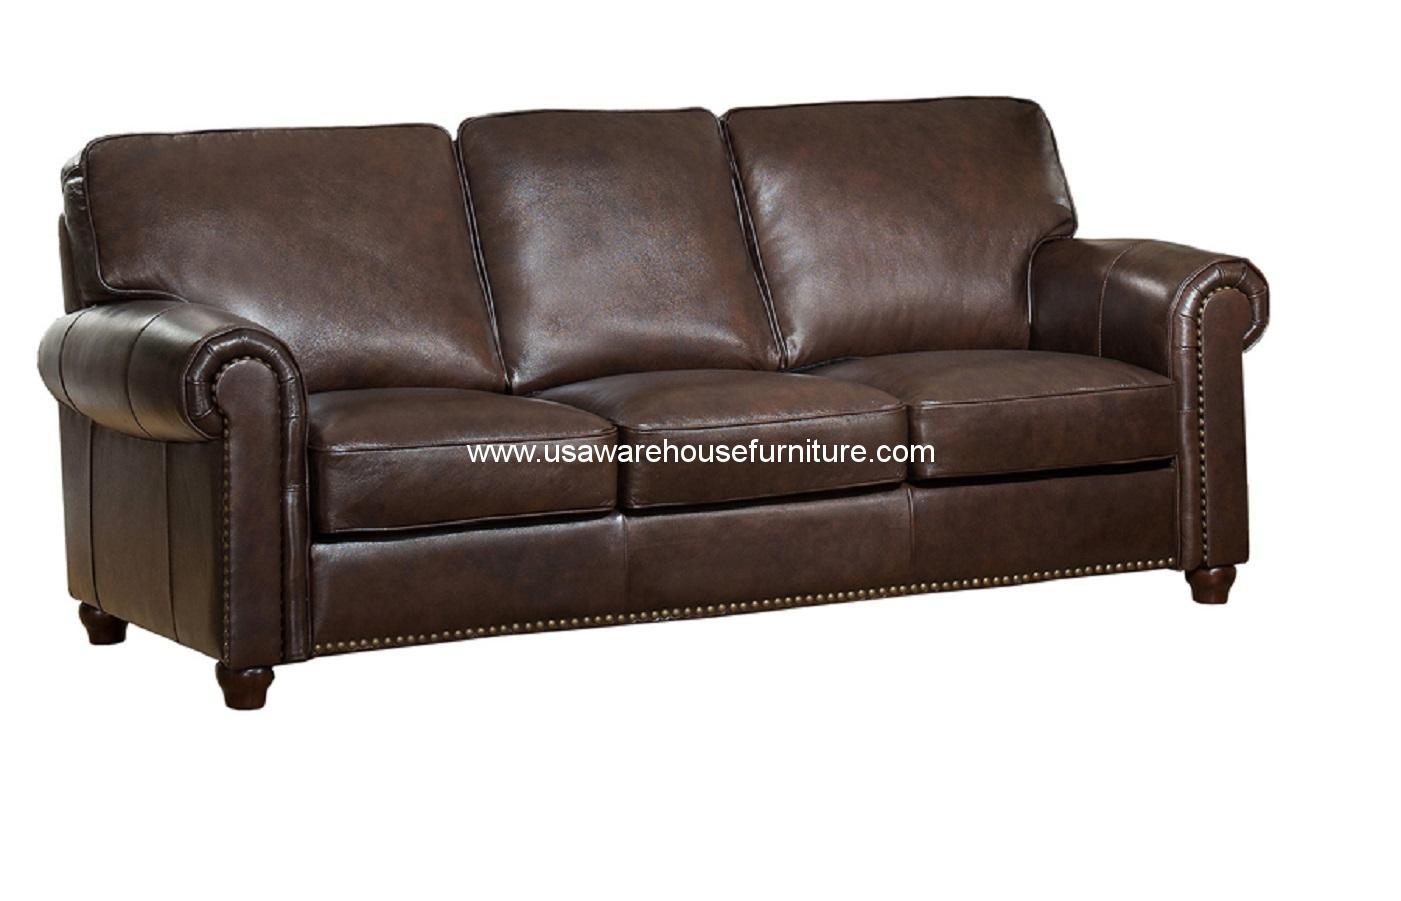 barbara dark brown full top grain leather sofa usa warehouse furniture. Black Bedroom Furniture Sets. Home Design Ideas